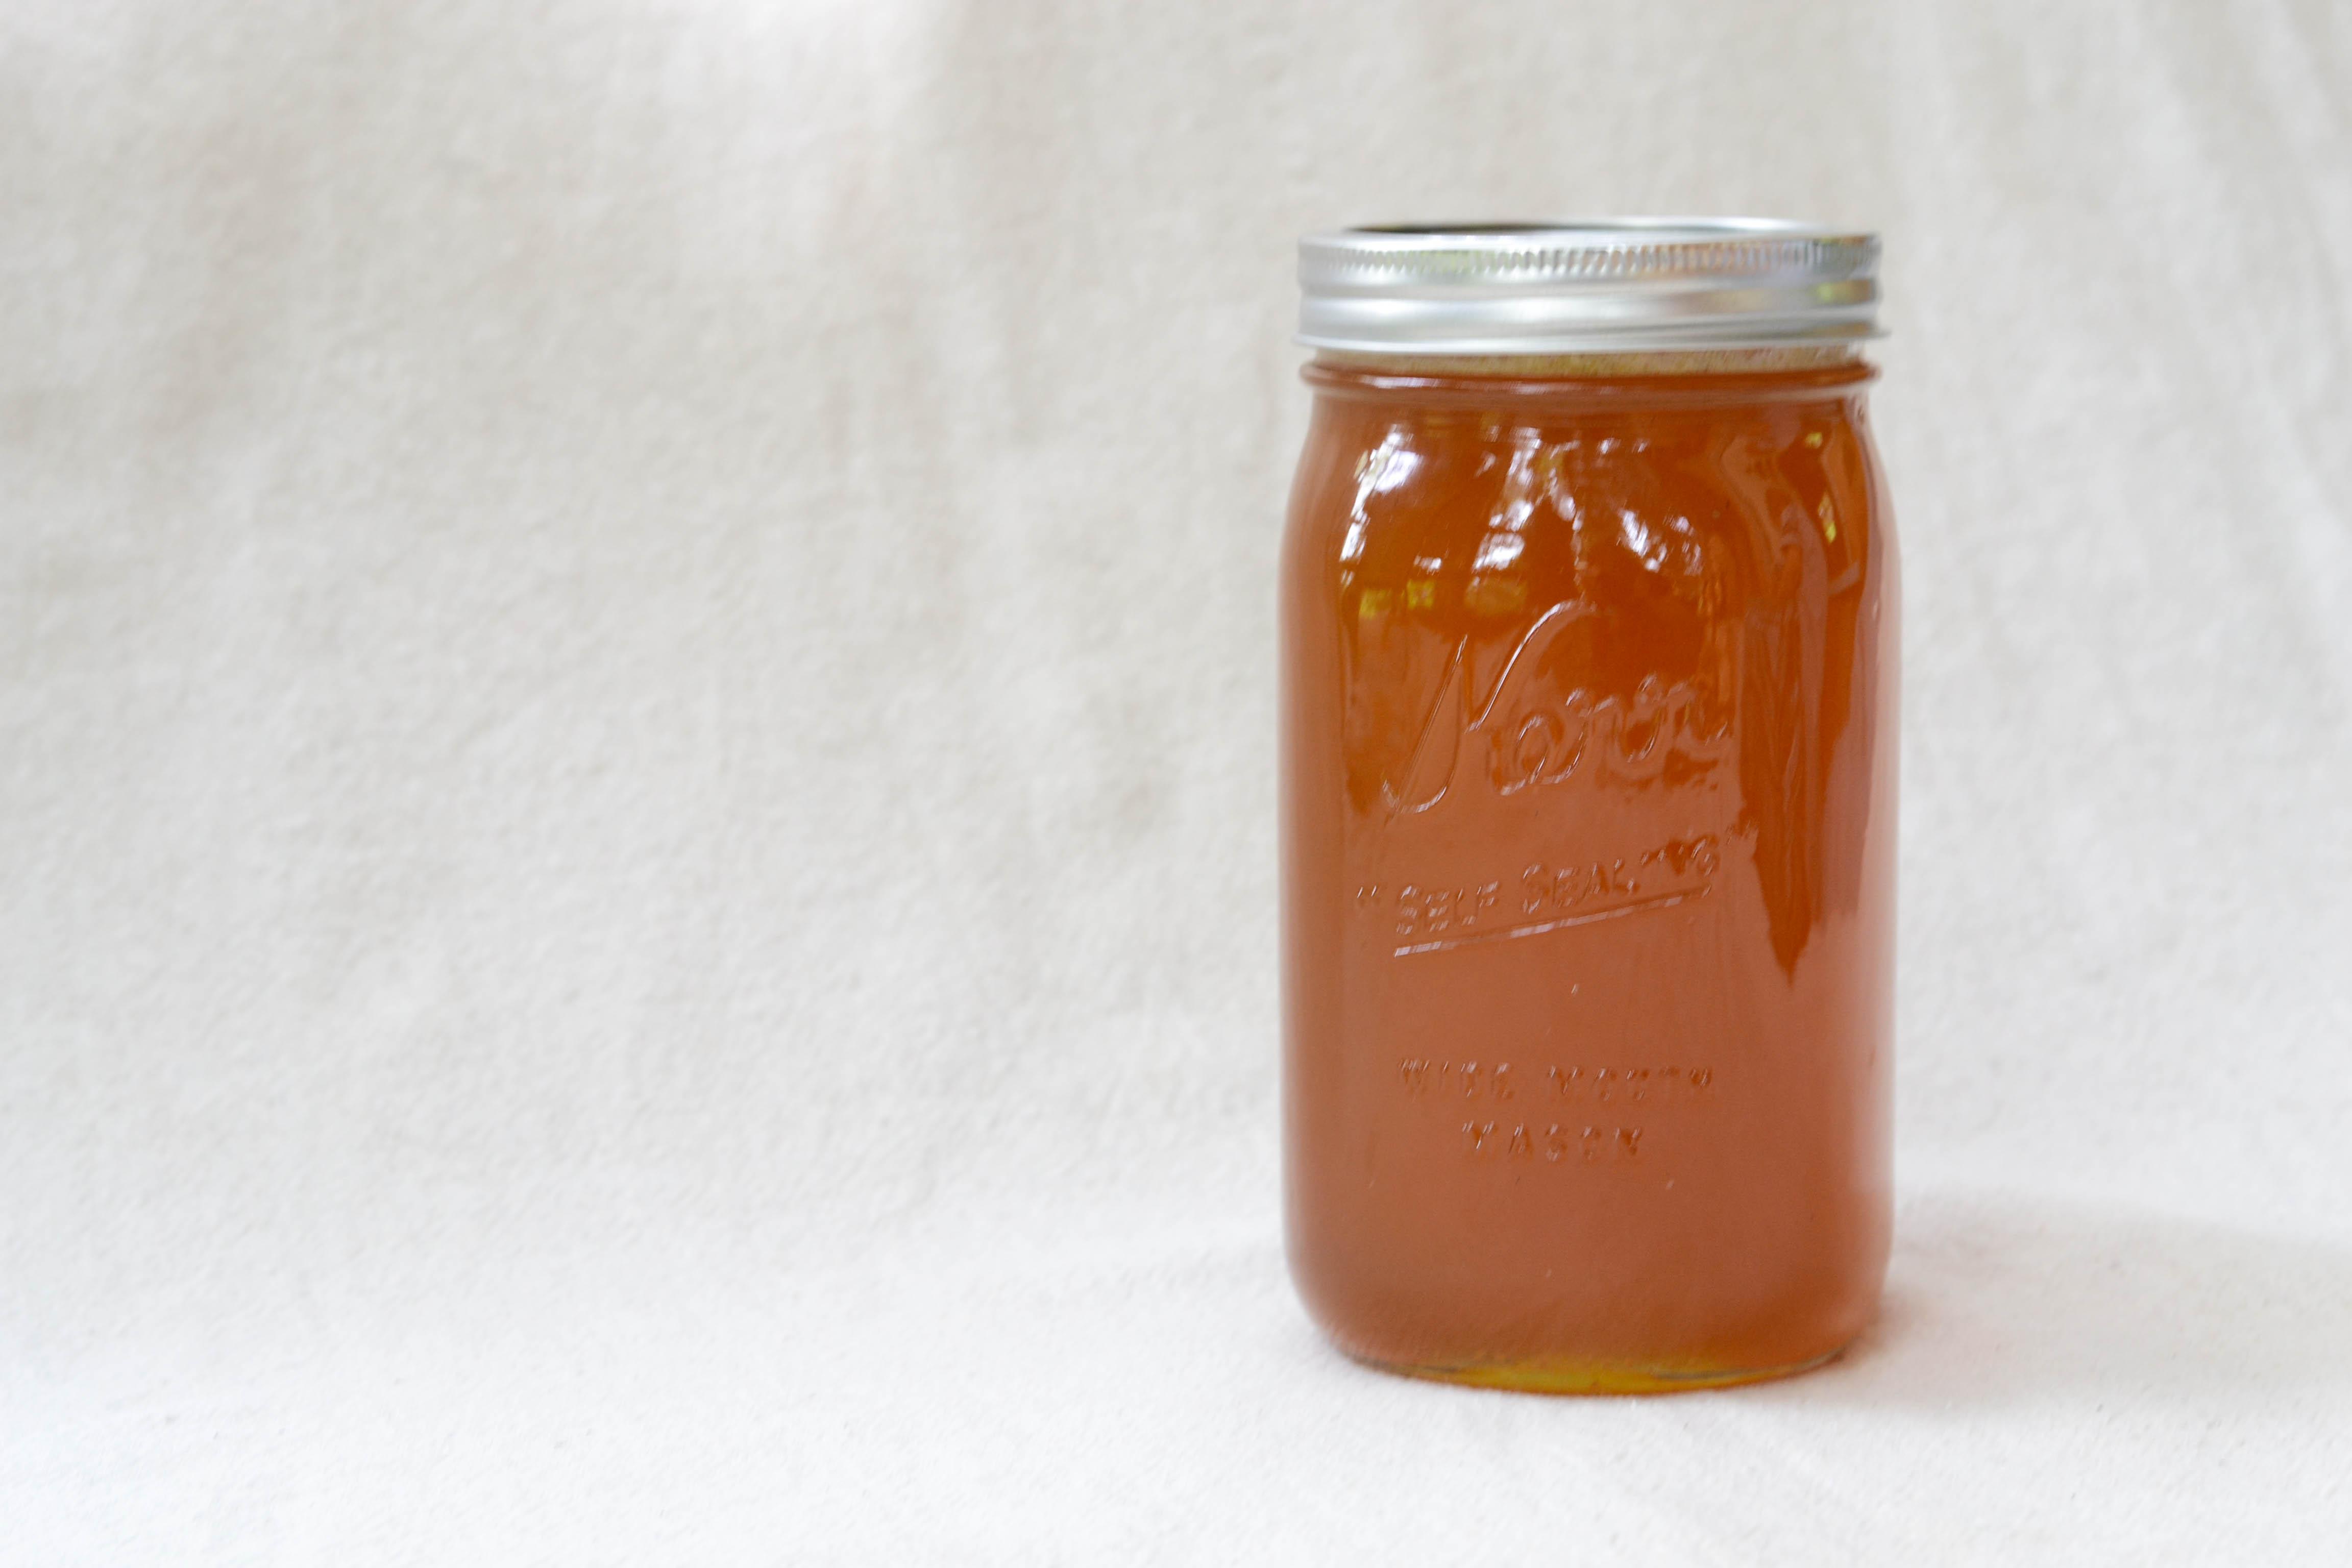 Consider, that Lick jar honey what phrase